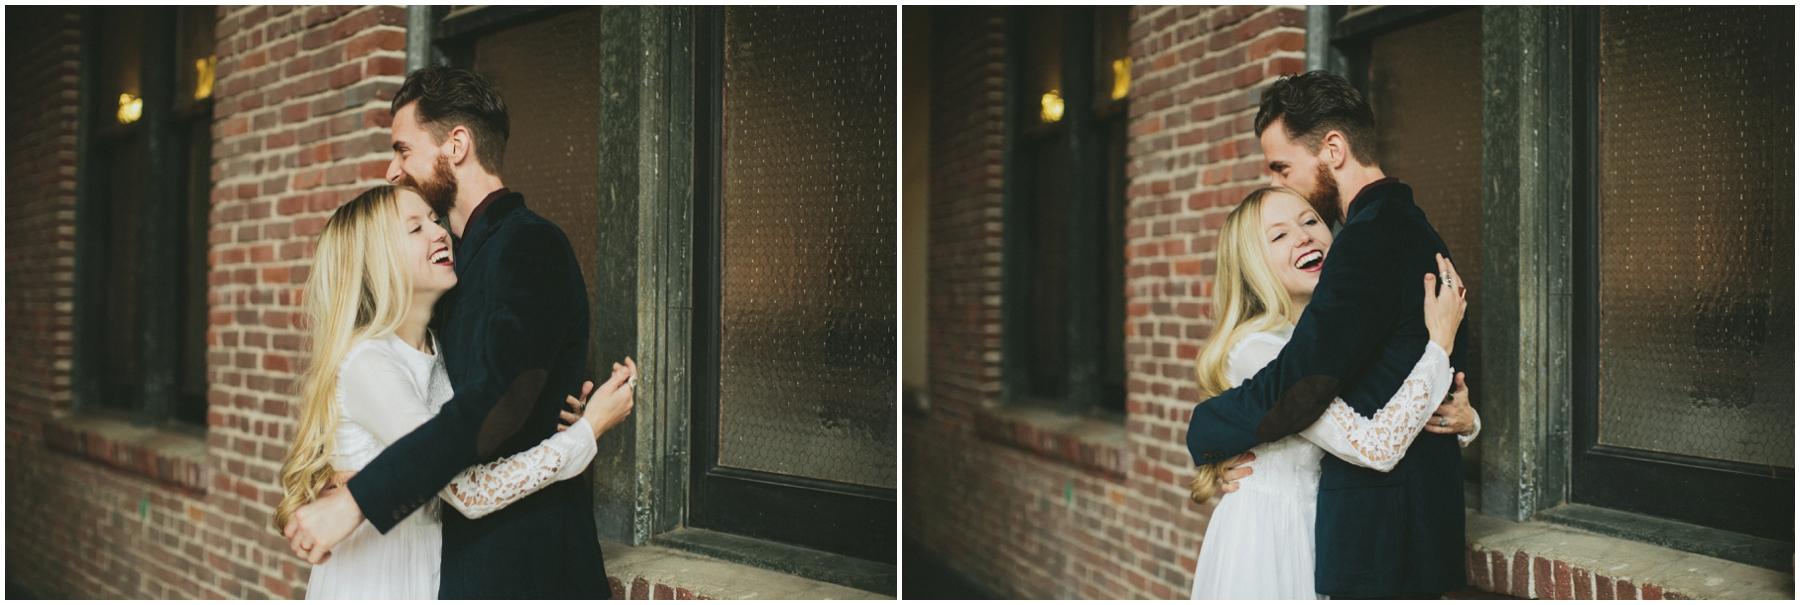 Natalie+Corey-WEDDING_KELLYBOITANO_0020